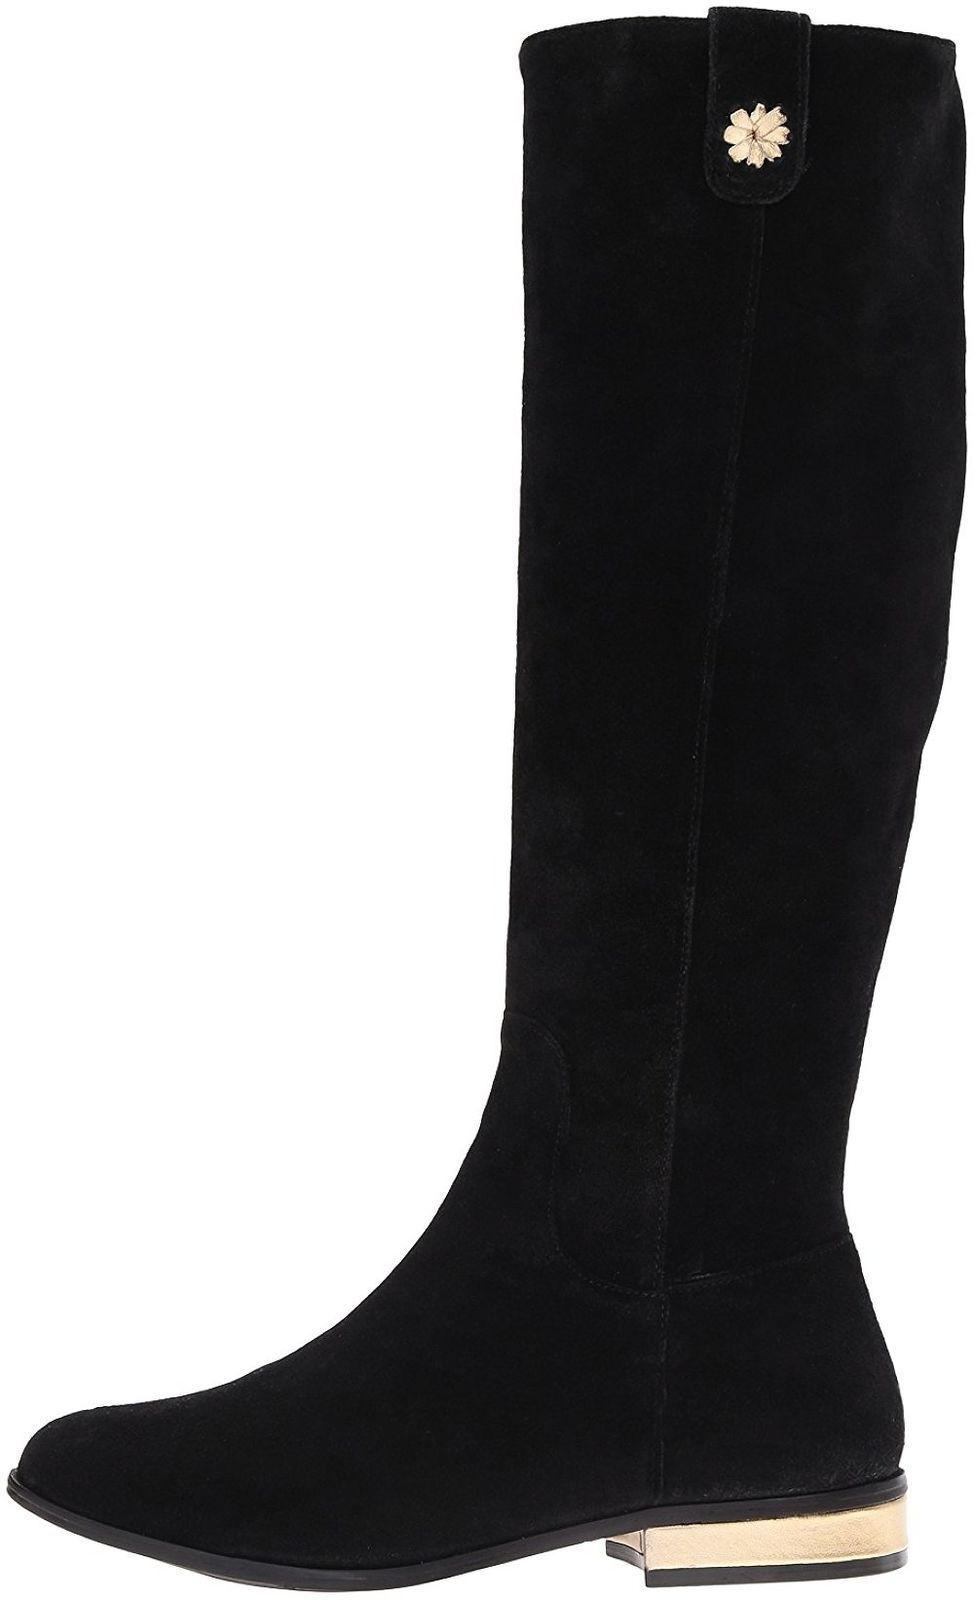 298 NEW Jack Rogers PARKER Black Suede Knee High Flat Boots Low Heel  5